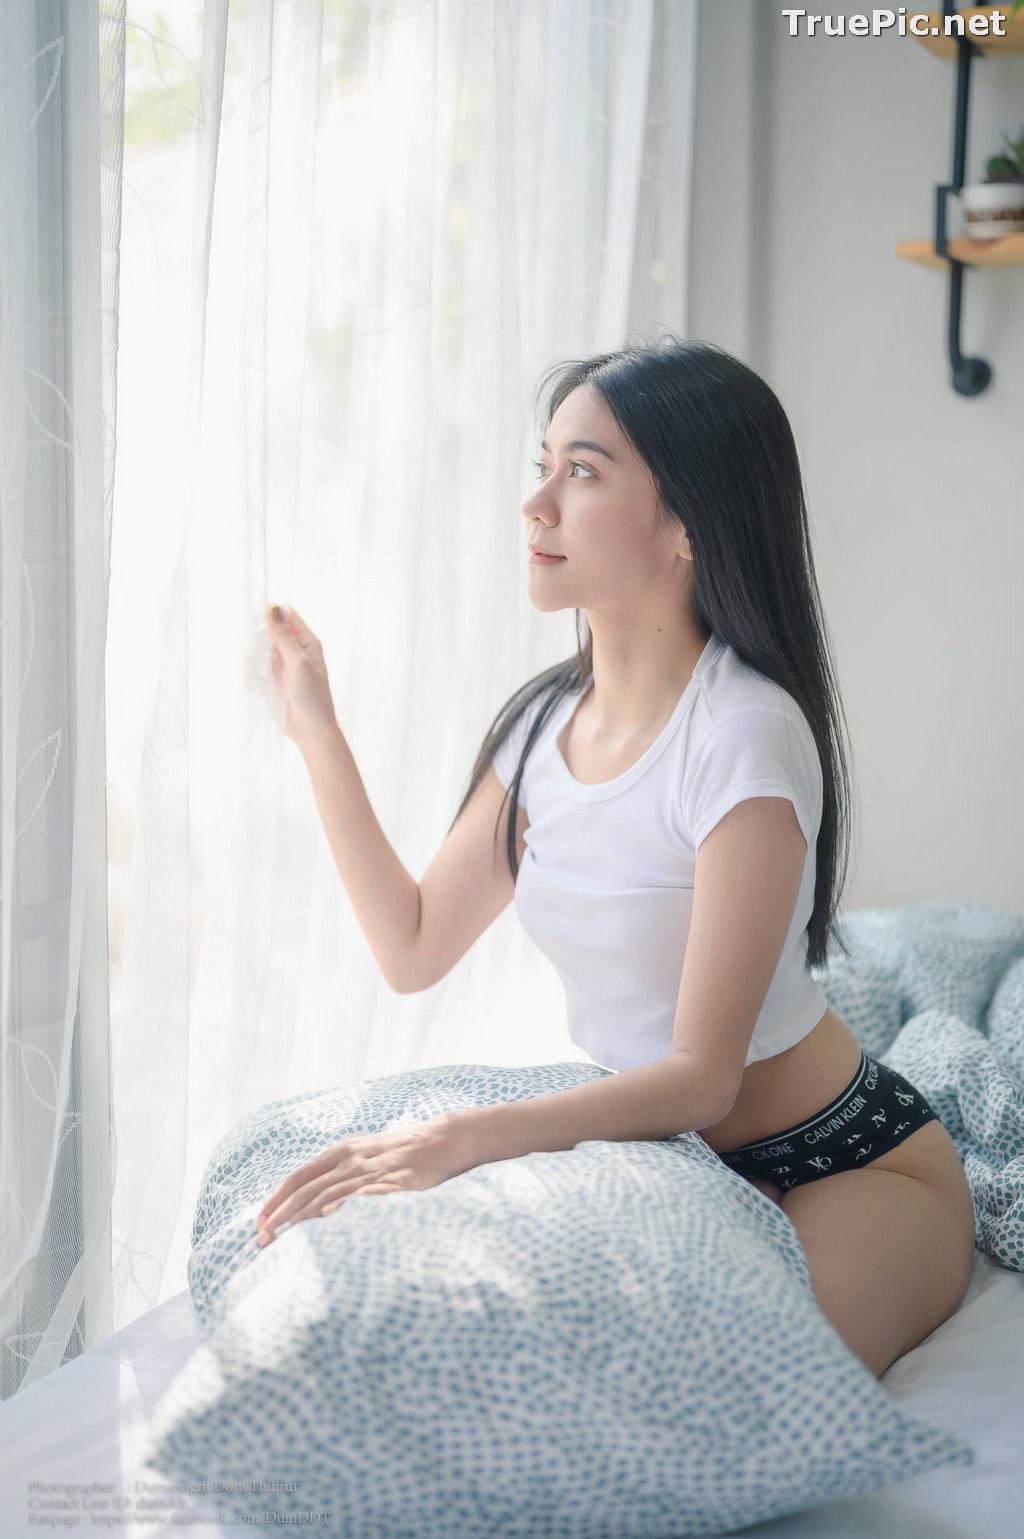 Image Thailand Model - Pattira Saisin - Reading @ Home - TruePic.net - Picture-8